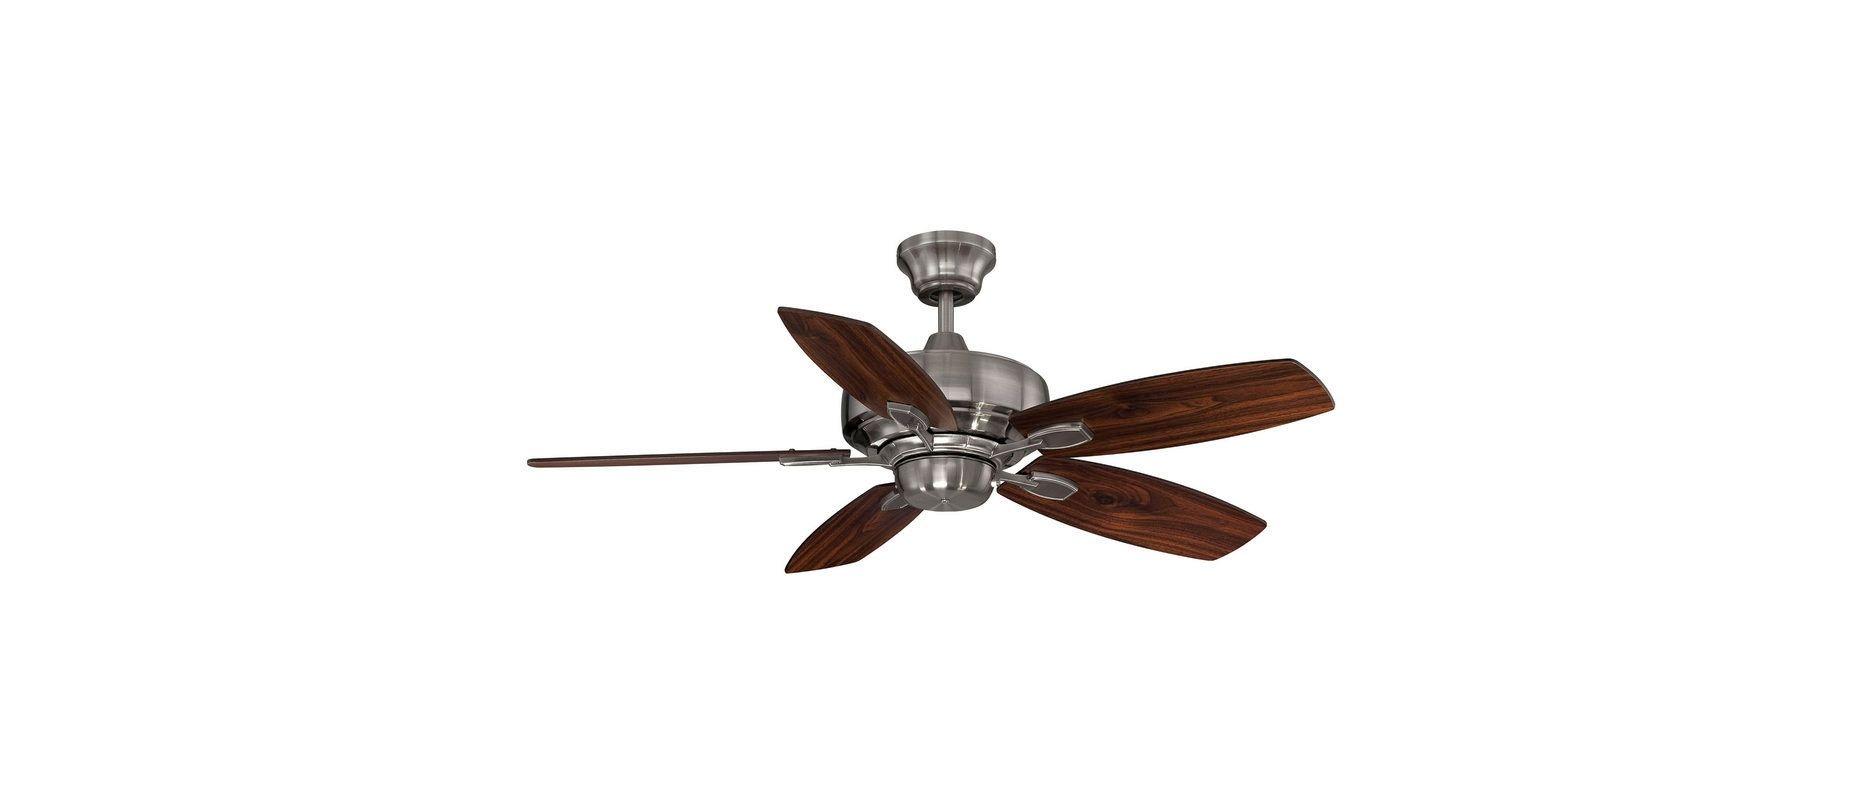 "Savoy House 42-830-5 Wind Star 42"" Span 5 Blade Indoor Ceiling Fan"